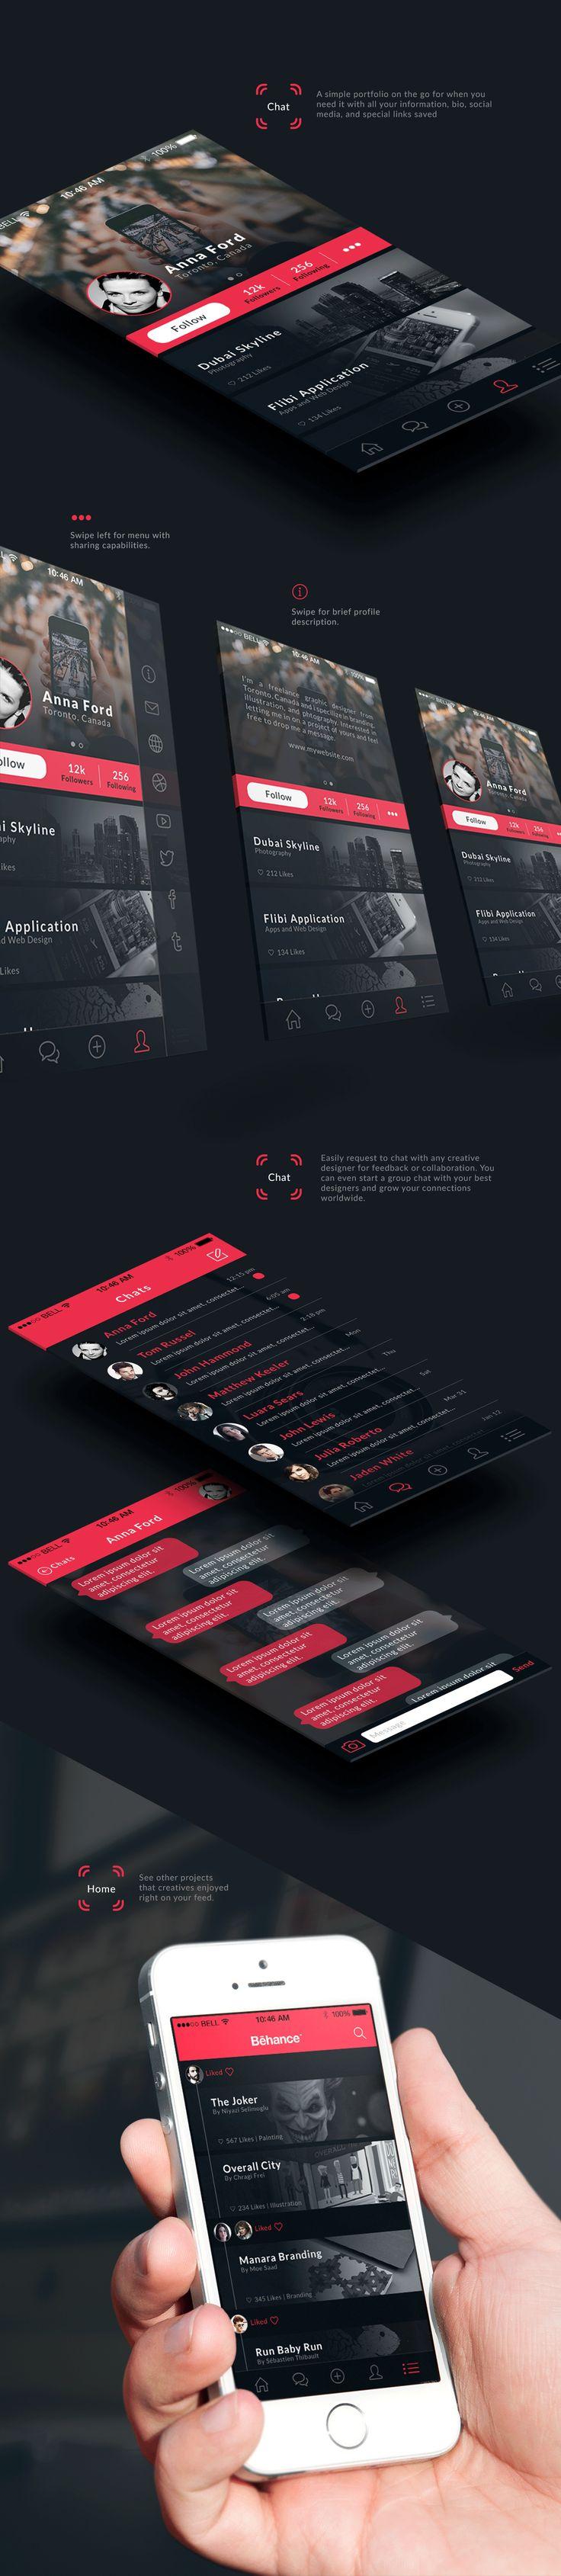 Behance Plus iPhone App on Behance. #UI #UserInterface #Design